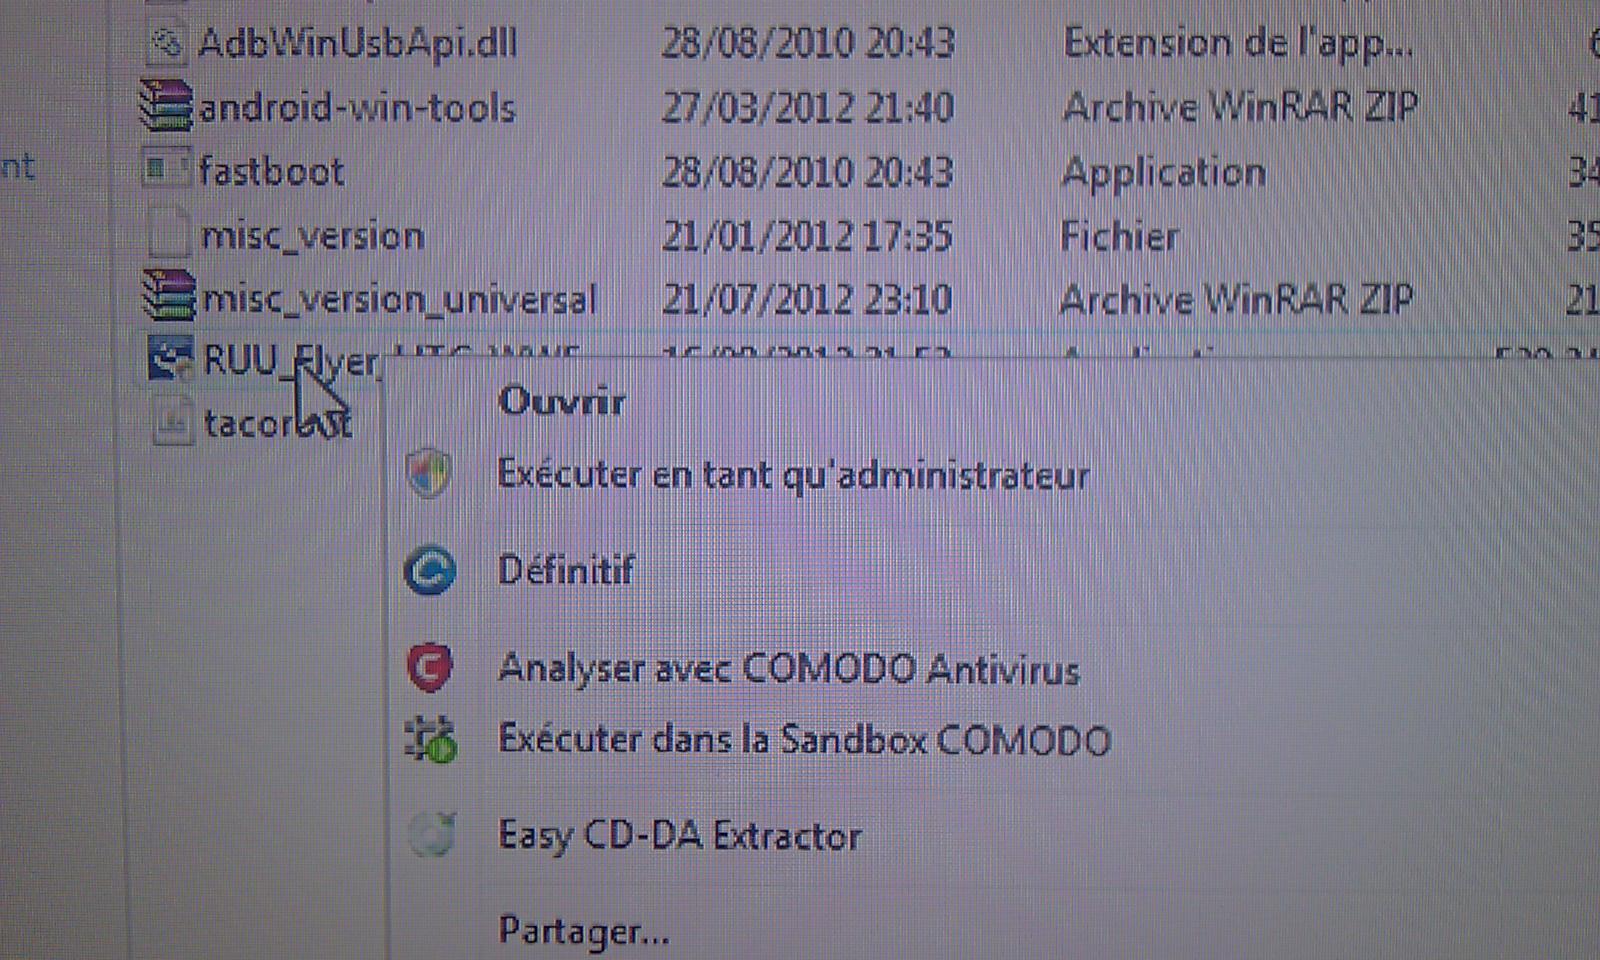 [Tuto] Downgrade vers GB, passage en S.Off, installation Leedroid GB 2.2.0 (en images) 294244DowngradeHC21